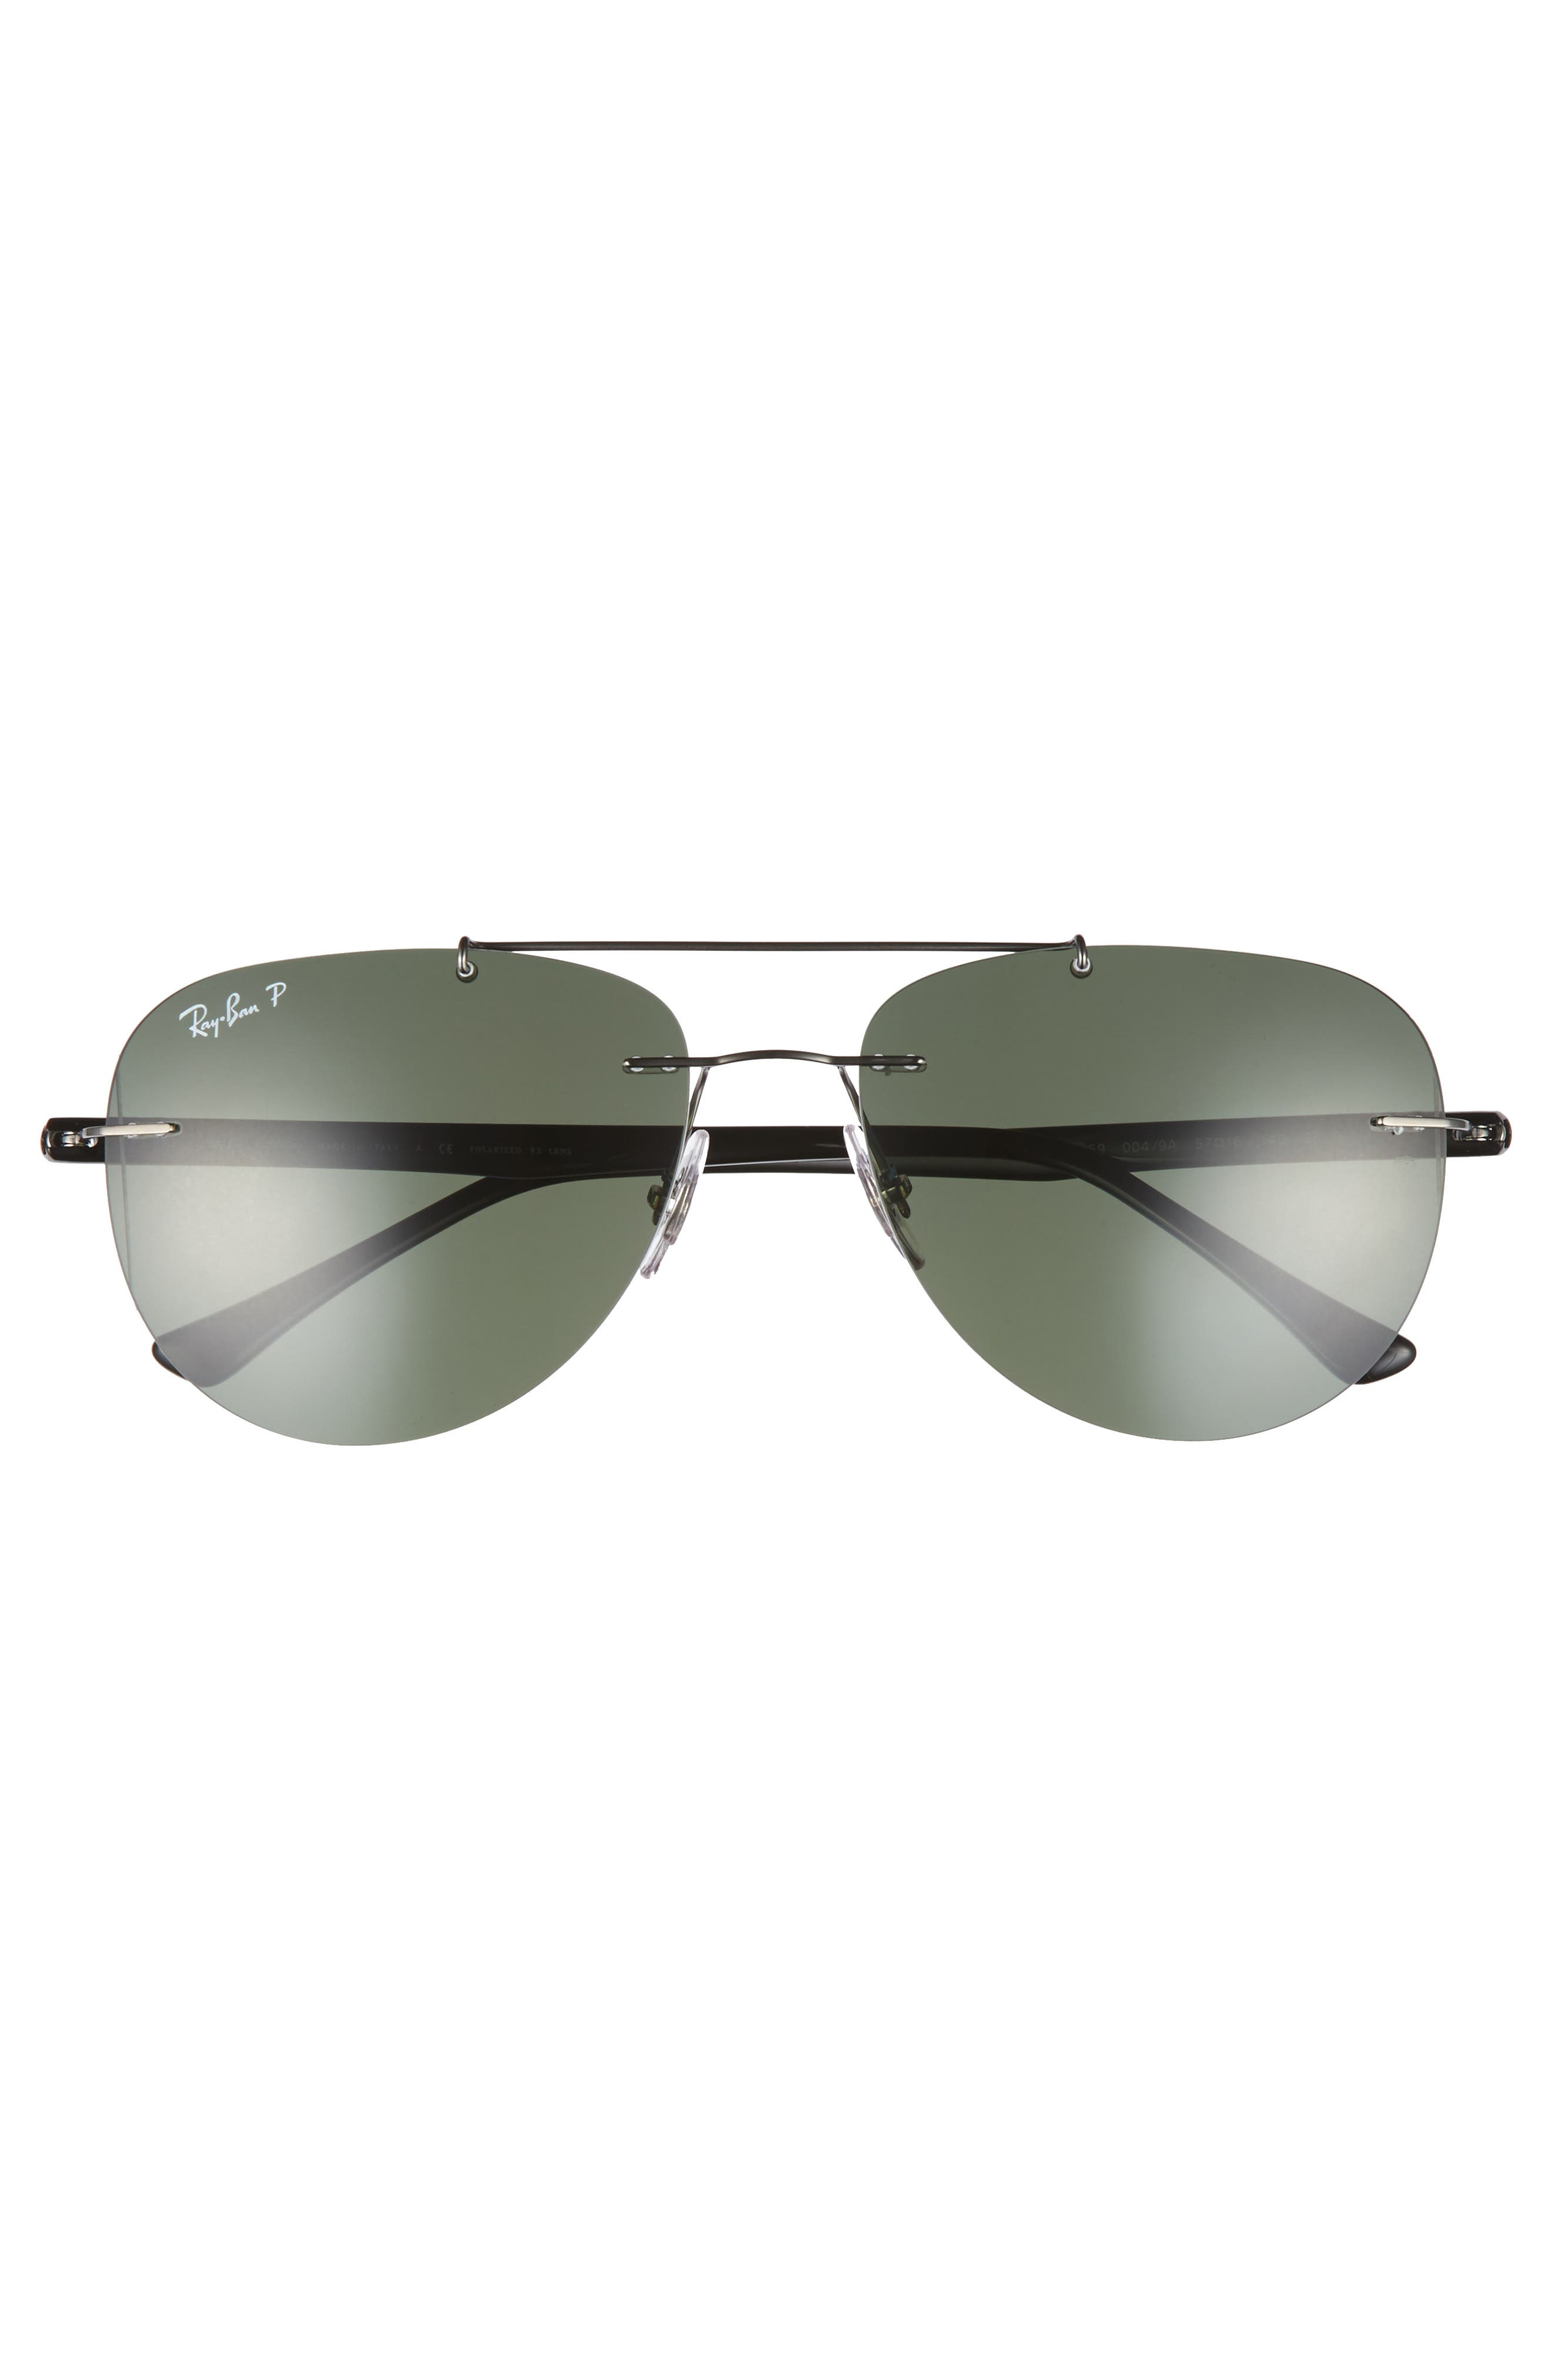 Phantos 57mm Polarized Rimless Aviator Sunglasses,                             Alternate thumbnail 3, color,                             020